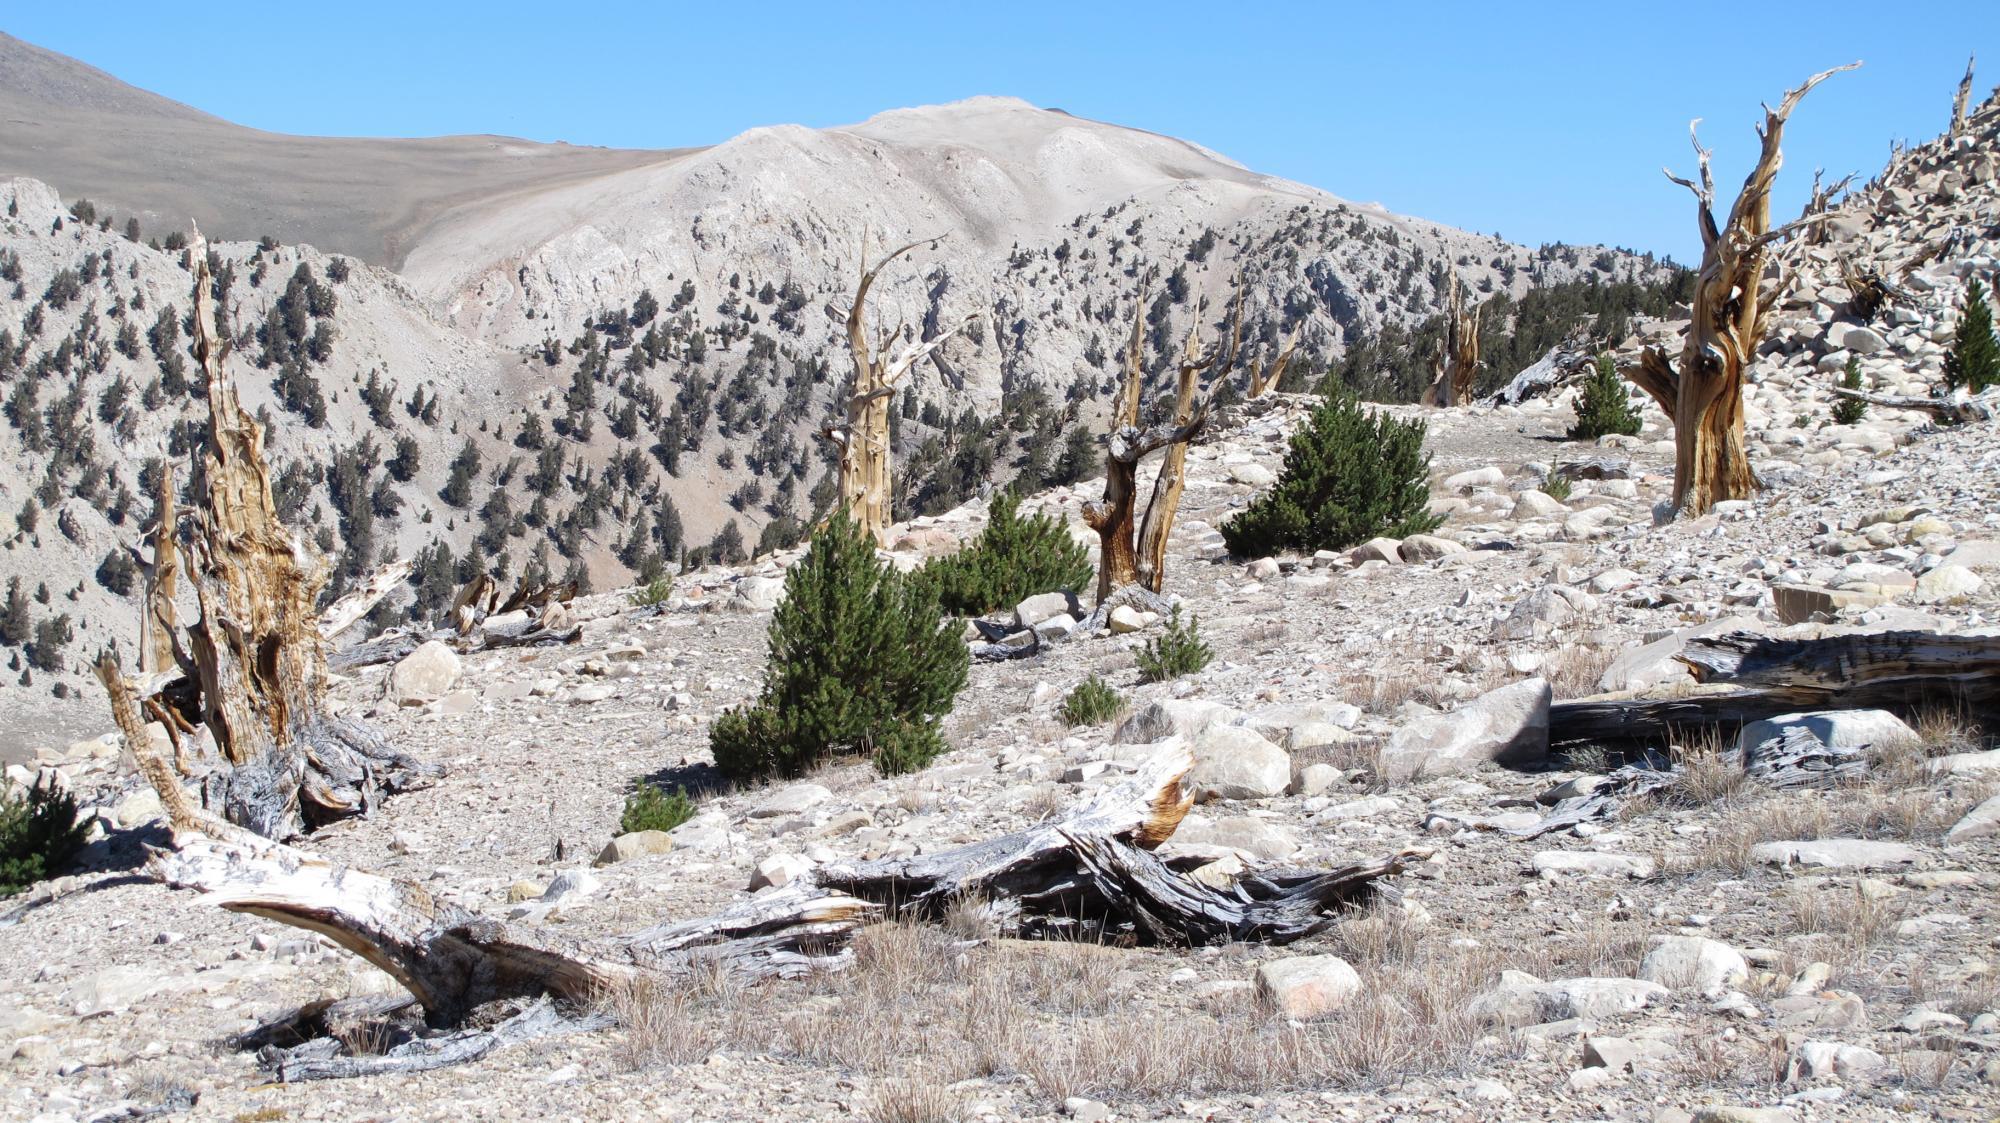 Bristlecone pine and limber pine